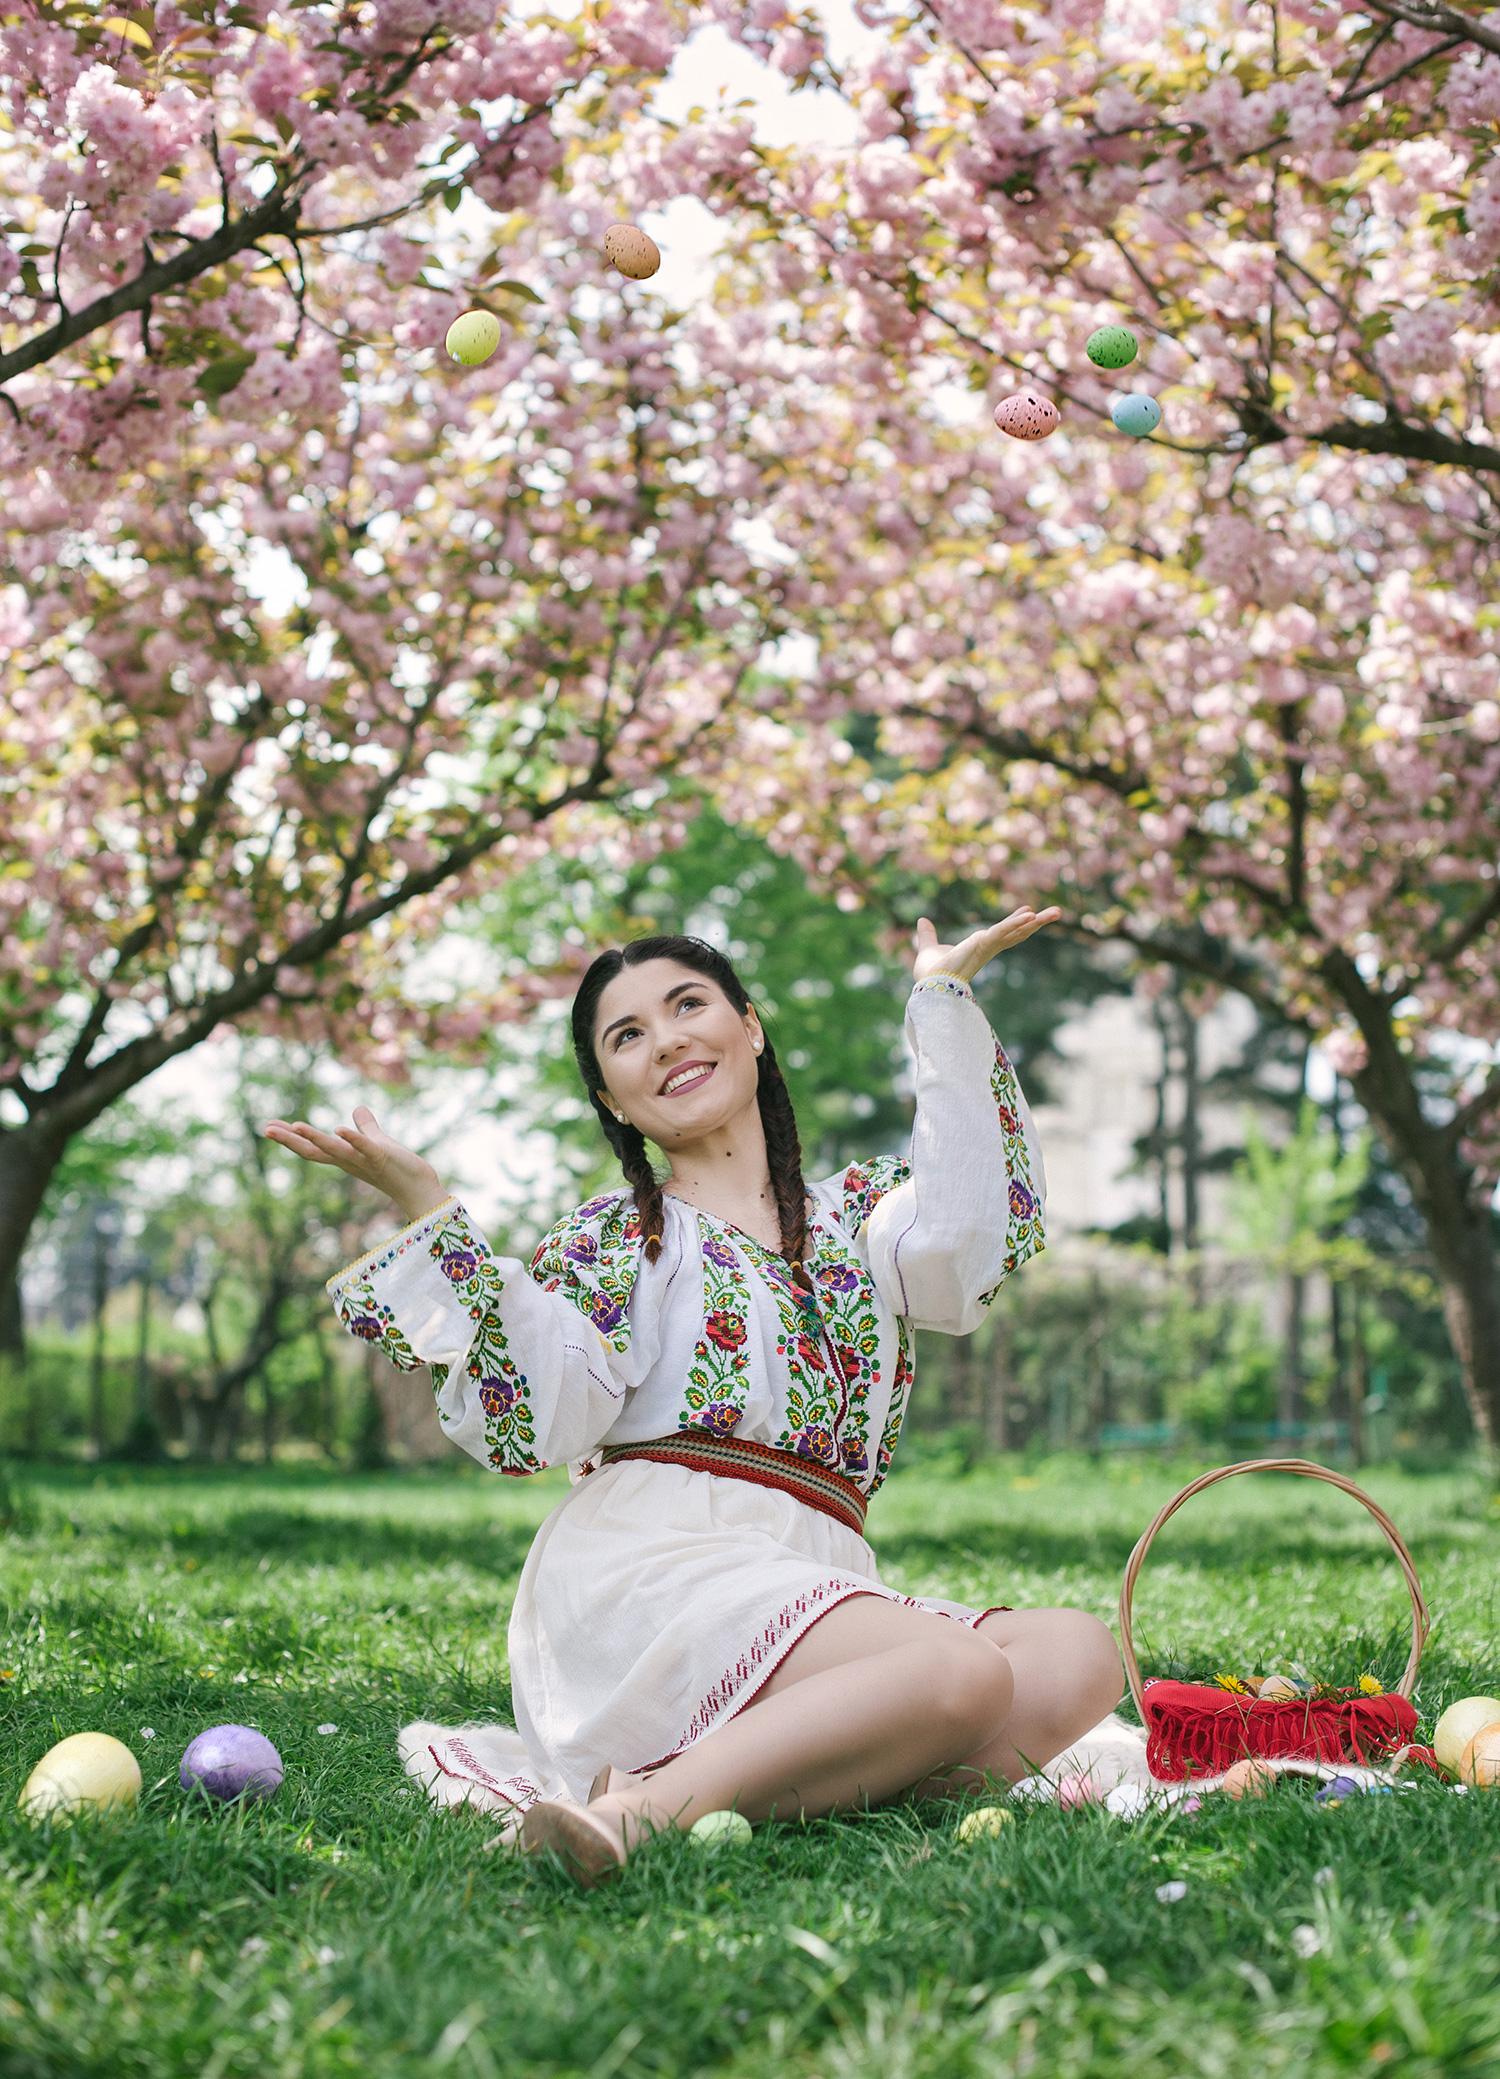 fotograf, fotograf profesionist, robert dumitru fotograf profesionist, fata frumoasa in costum popular traditional romanesc, pomi infloriti primavara, pomi frumosi infloriti,